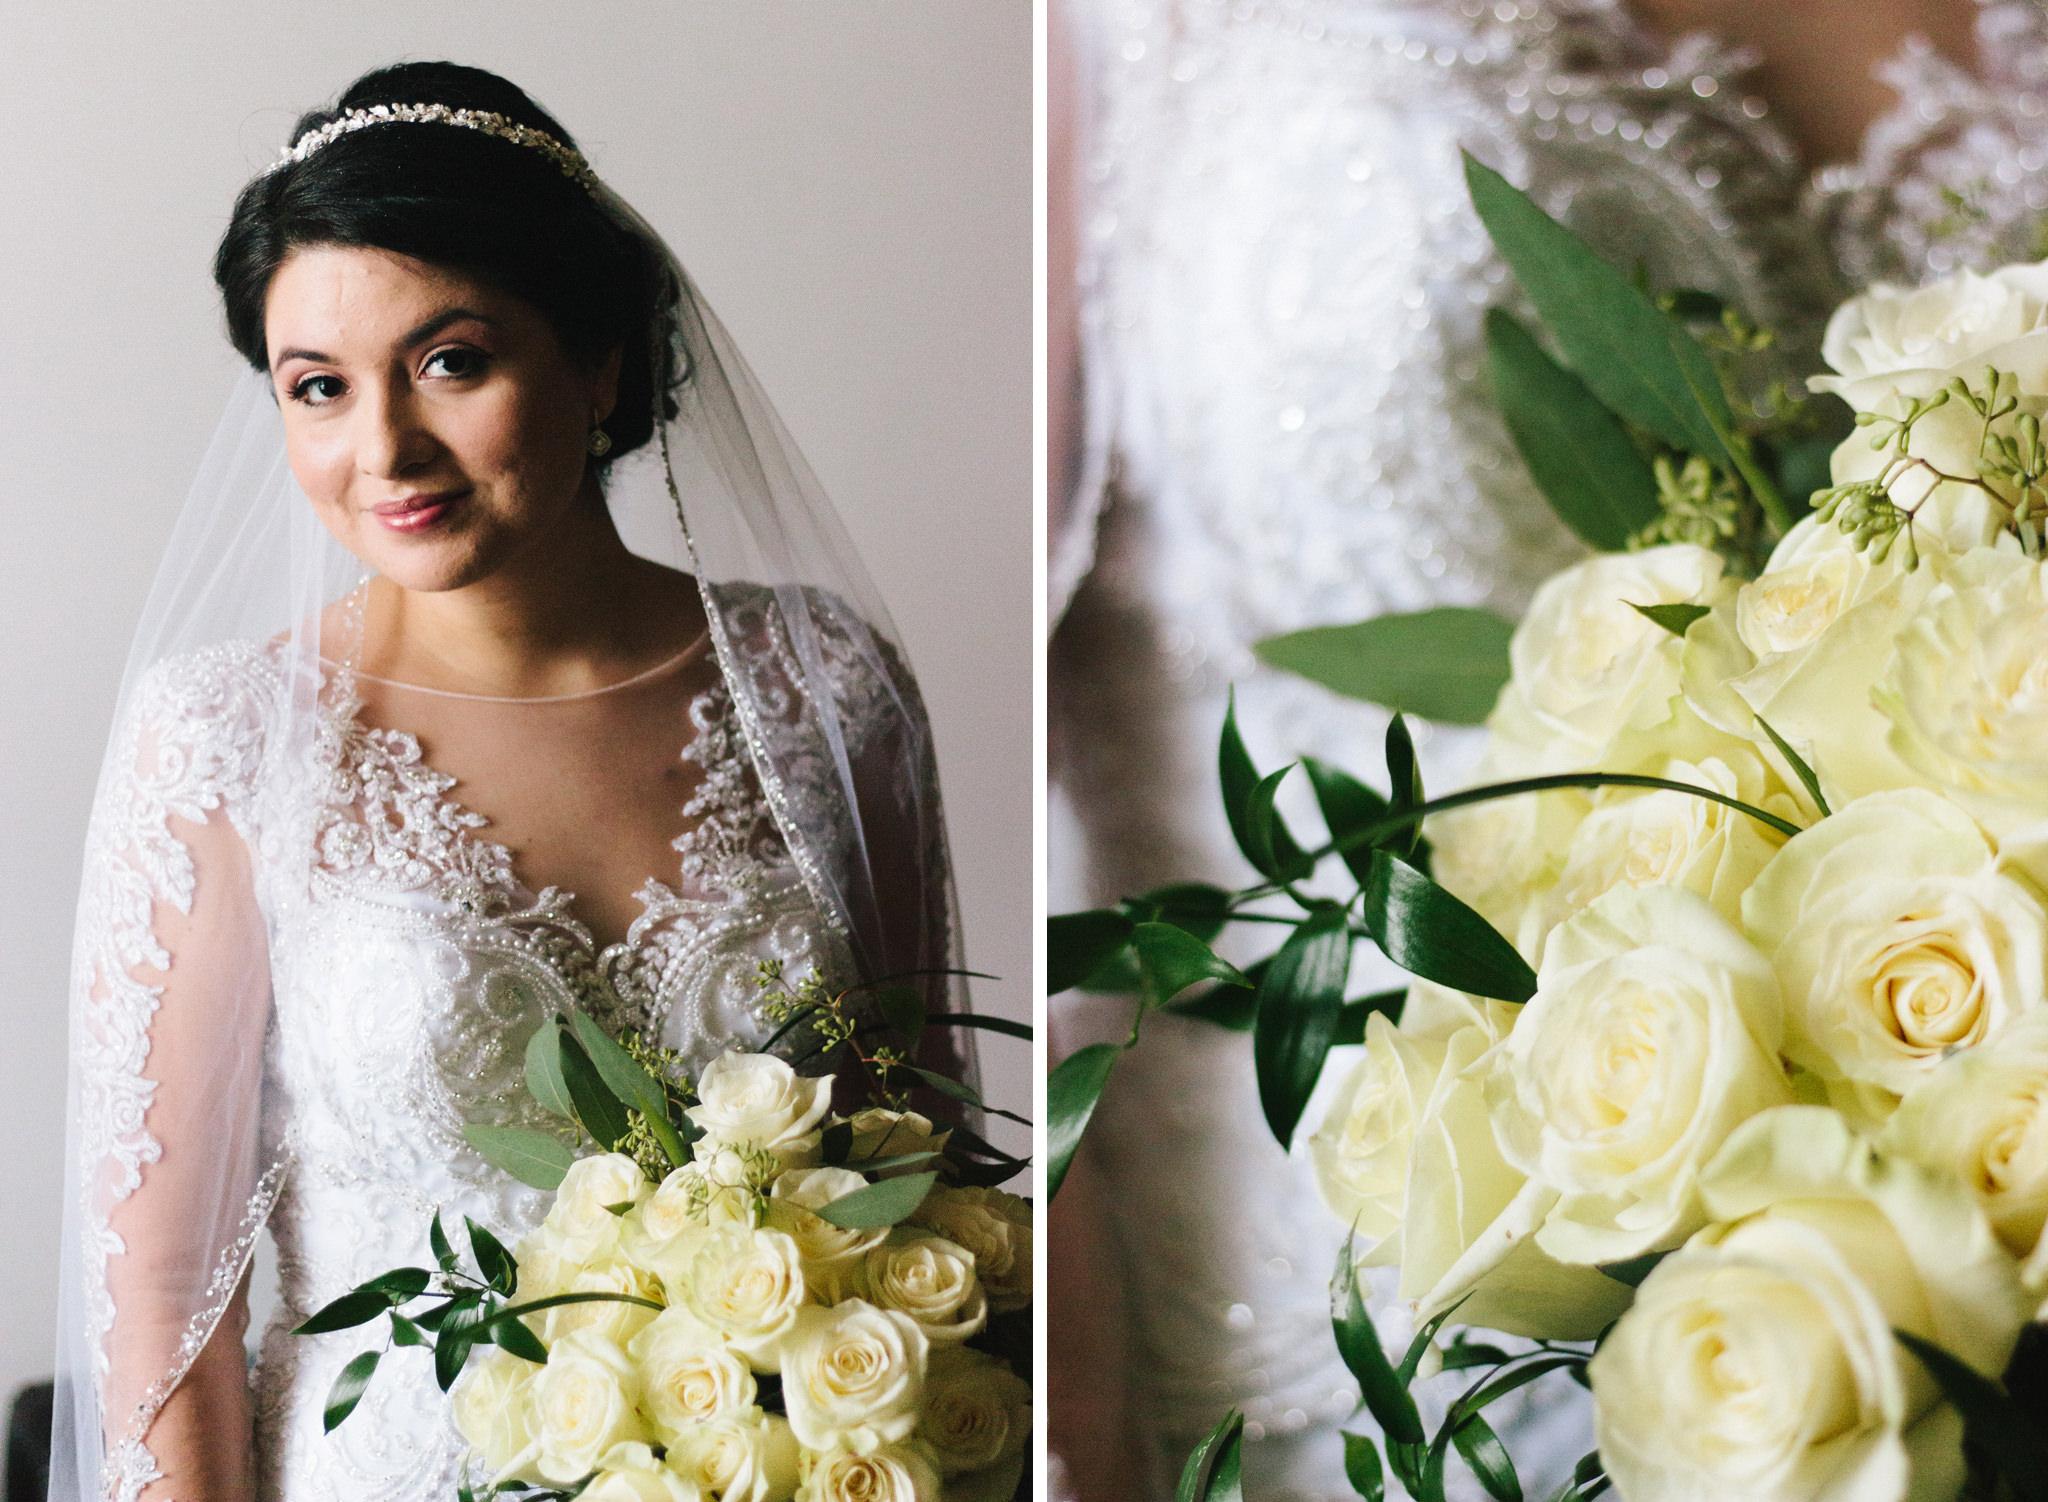 003-rempel-photography-chicago-wedding-inspiration-susan-daniel-michigan-metro-detroit-christian-church-holly-vault-cupcakes-and-kisses.jpg